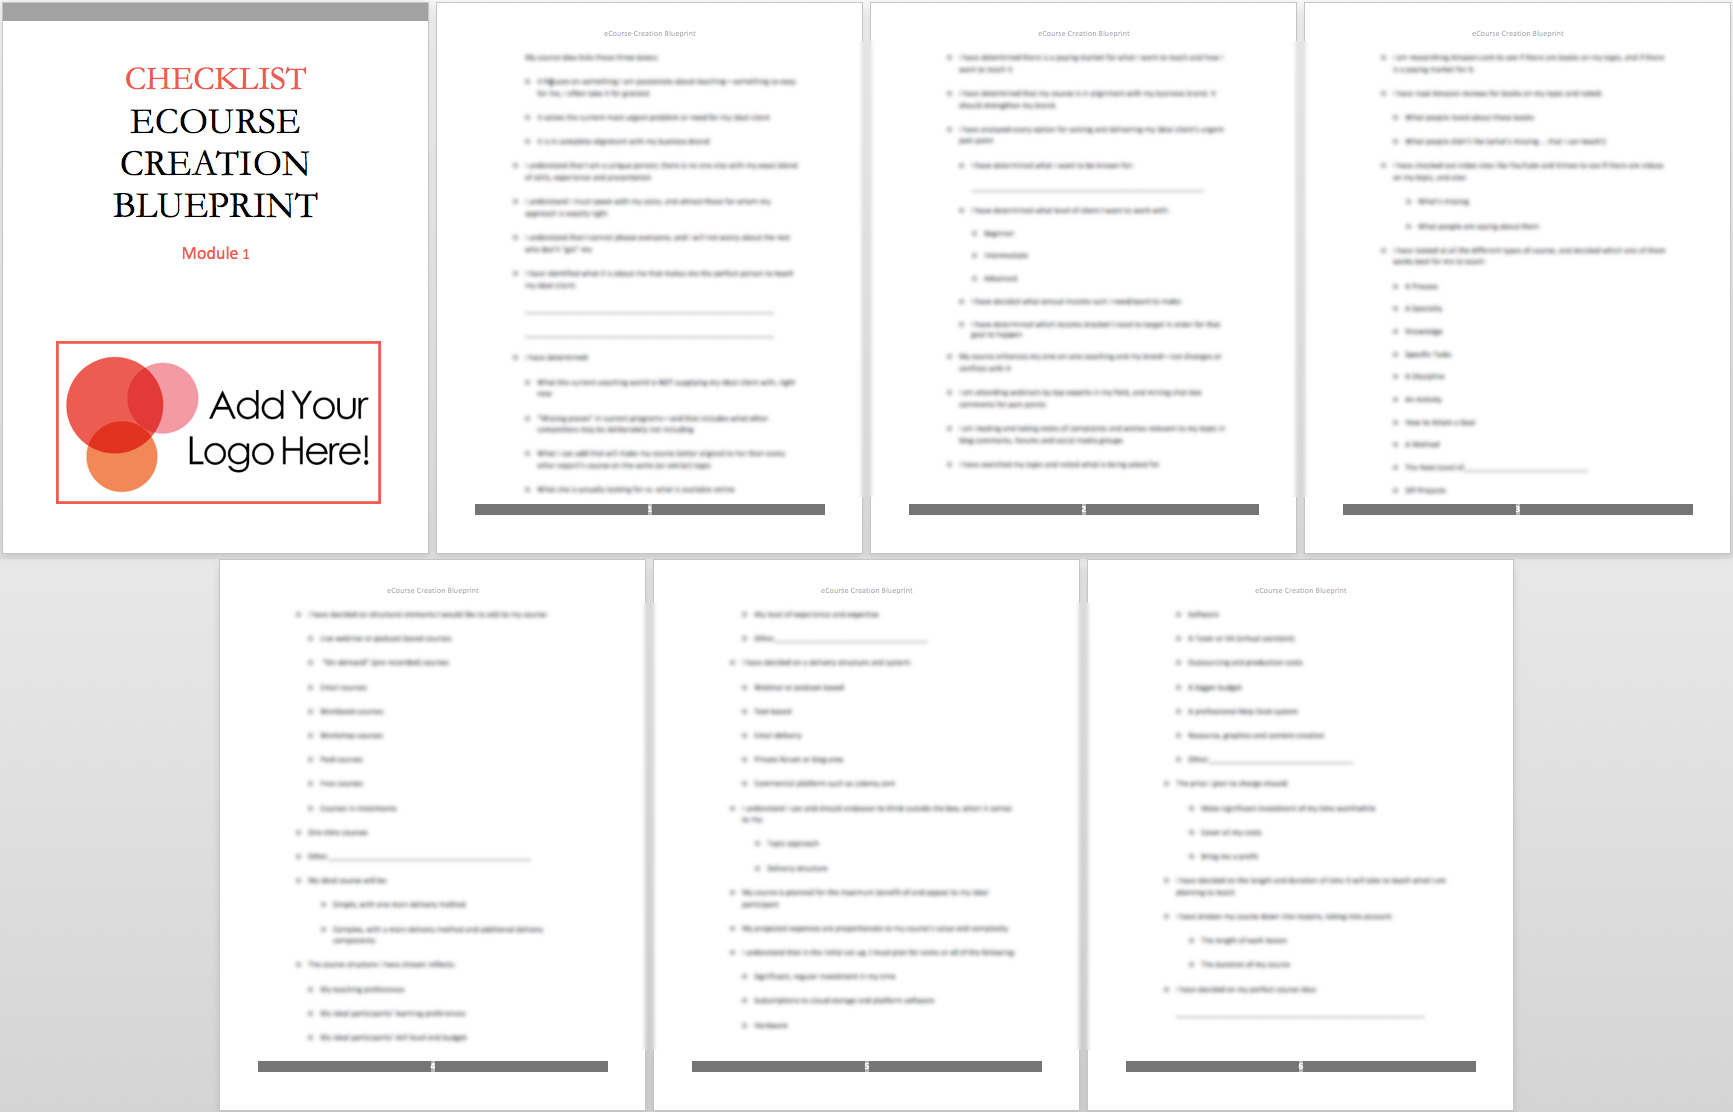 mod-1-checklist